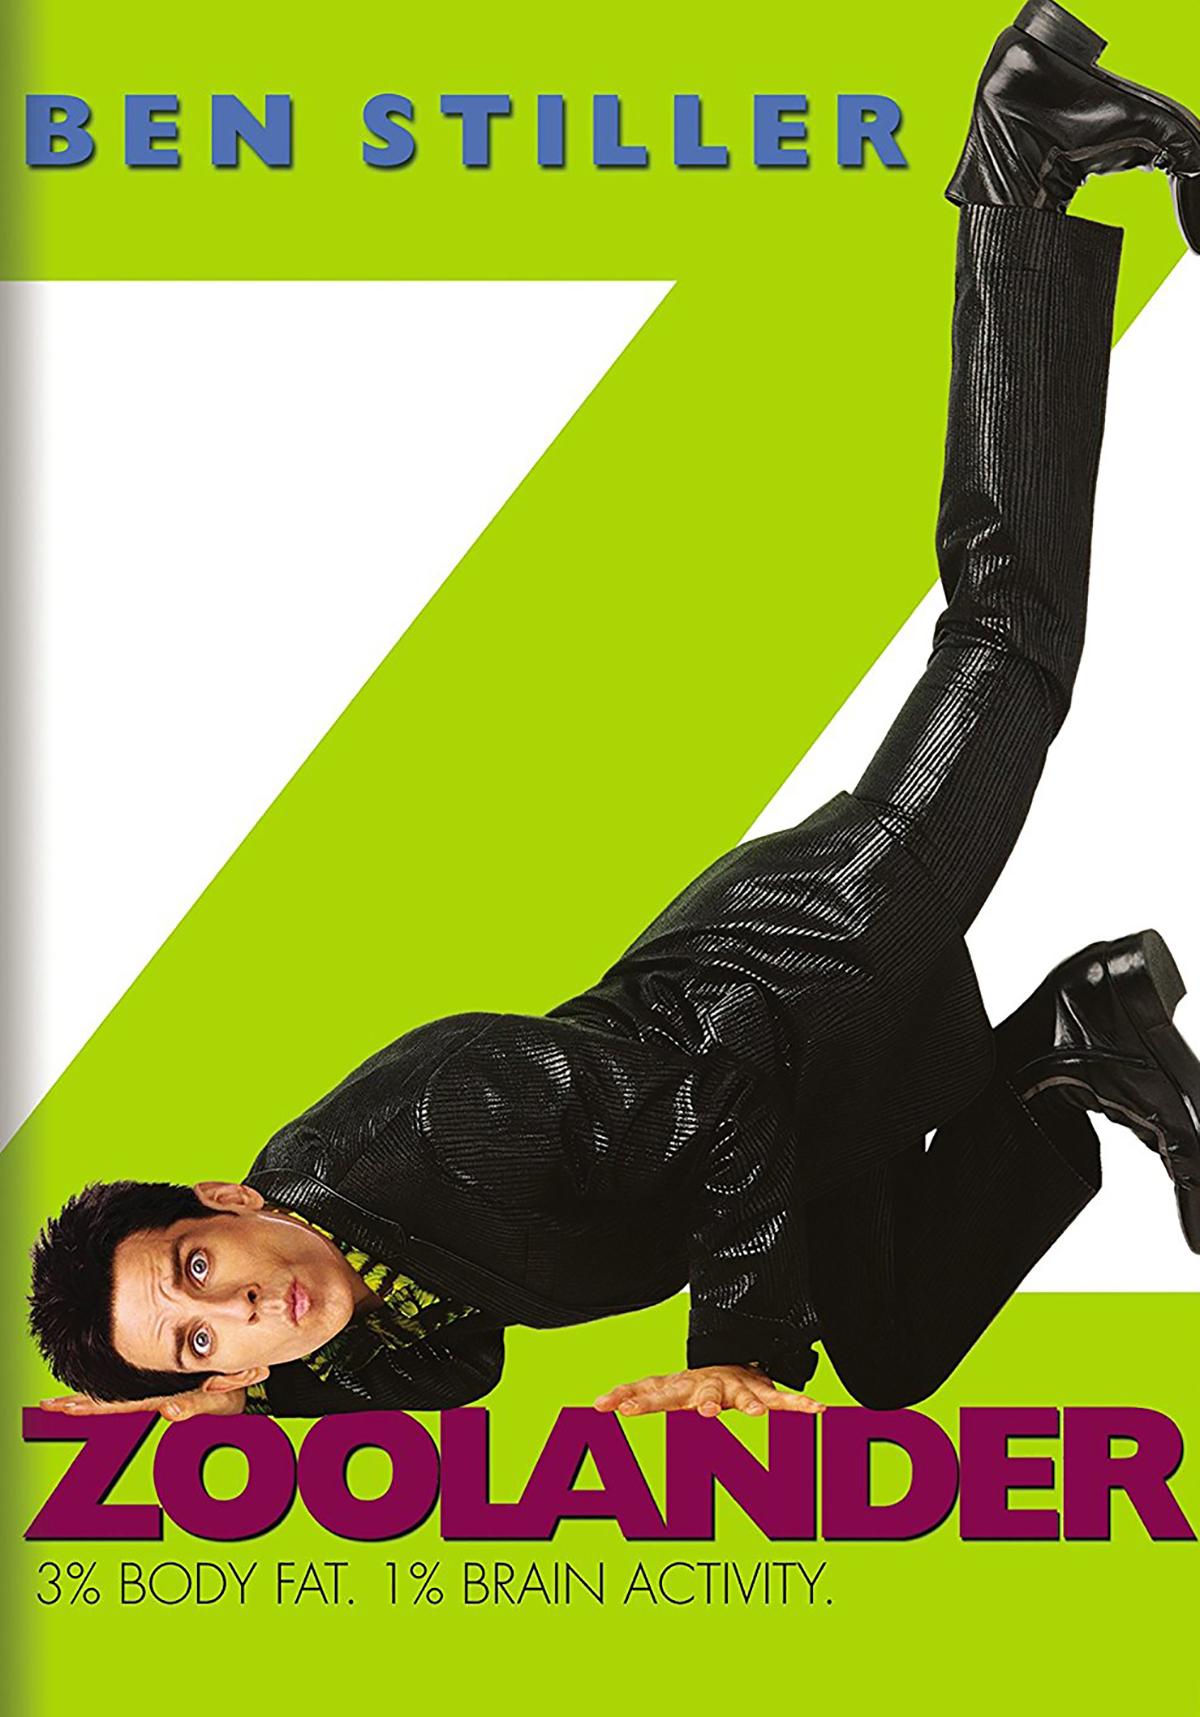 DVD Review: Zoolander - Slant Magazine